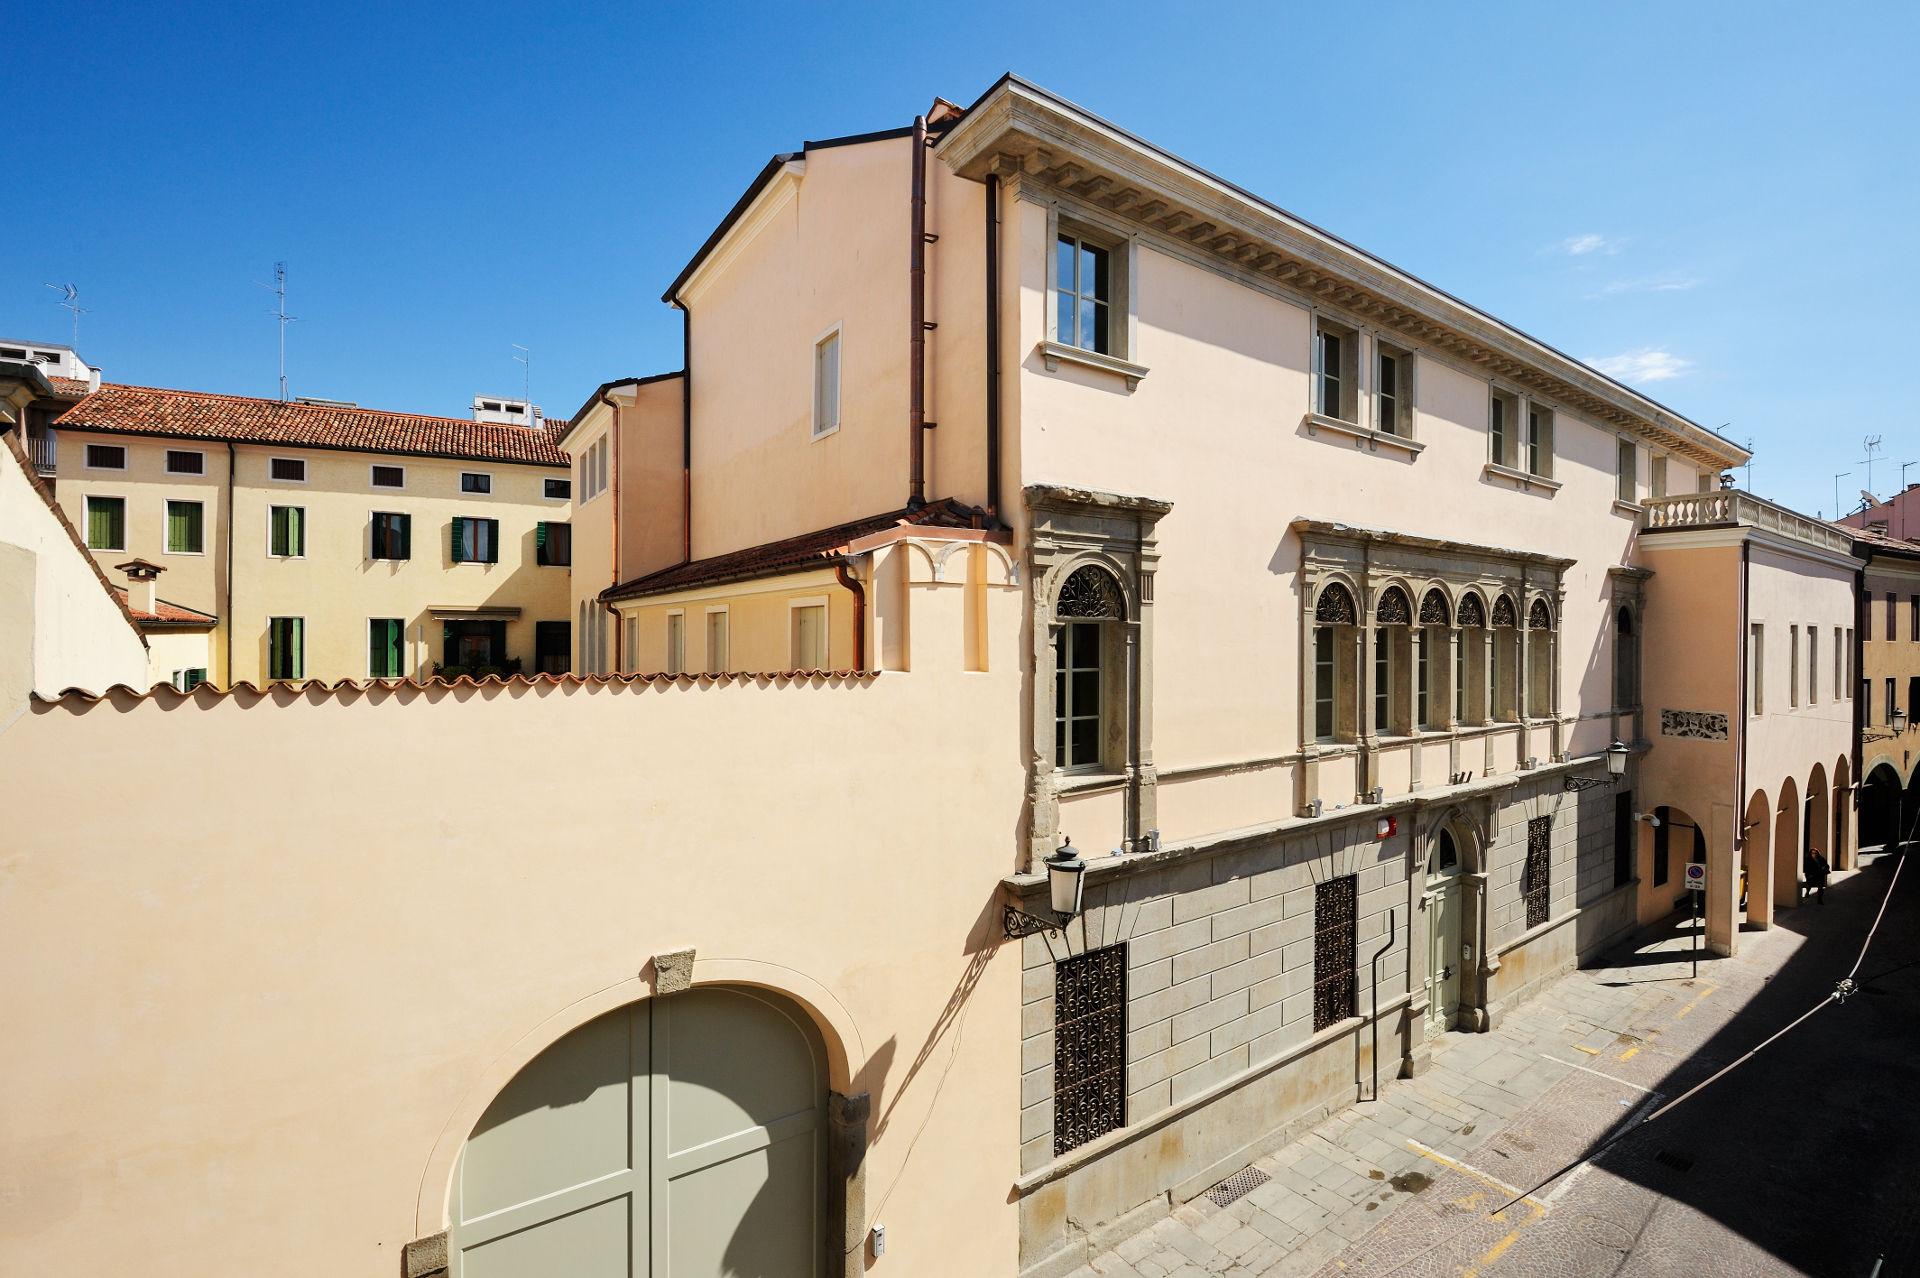 Palazzo Dondi dall'Orologio - image 5